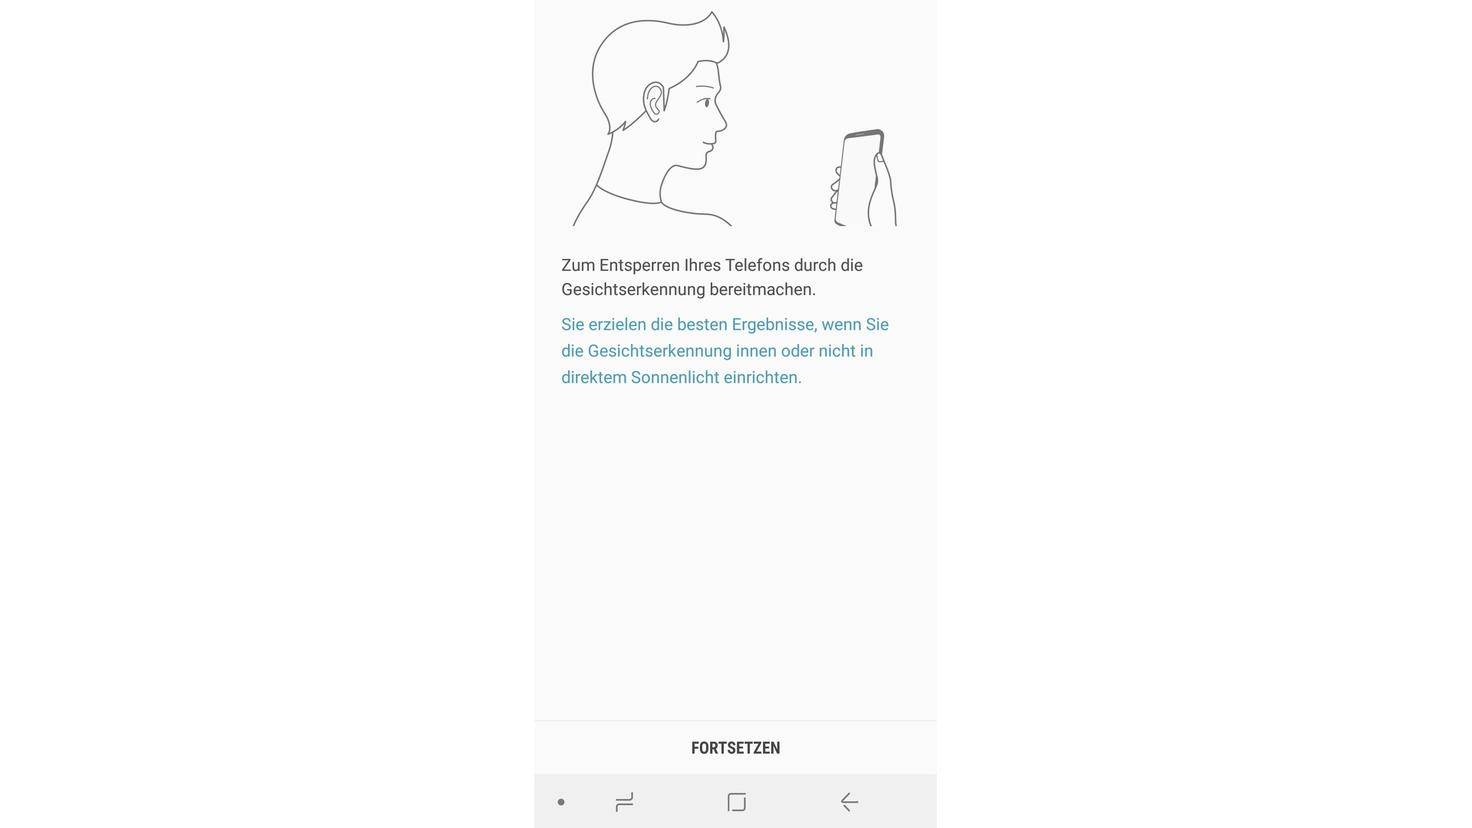 Samsung-Galaxy-A8-Gesichtserkennung